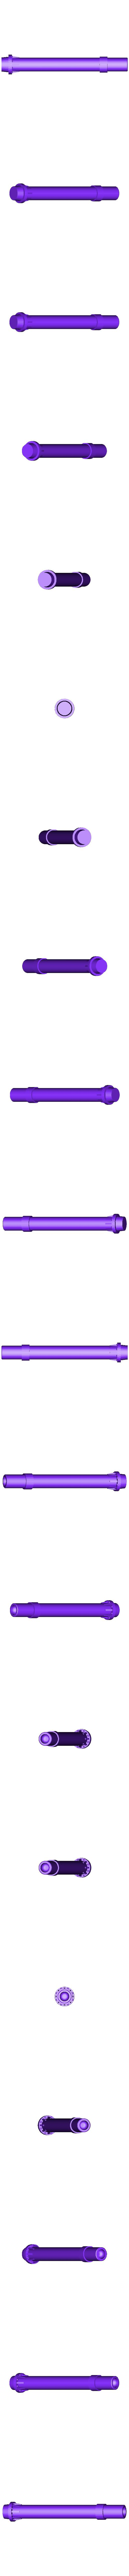 Artillery_Gun_Barrel_Sized.stl Download free STL file Catoblepas SPG • 3D printable design, nfeyma